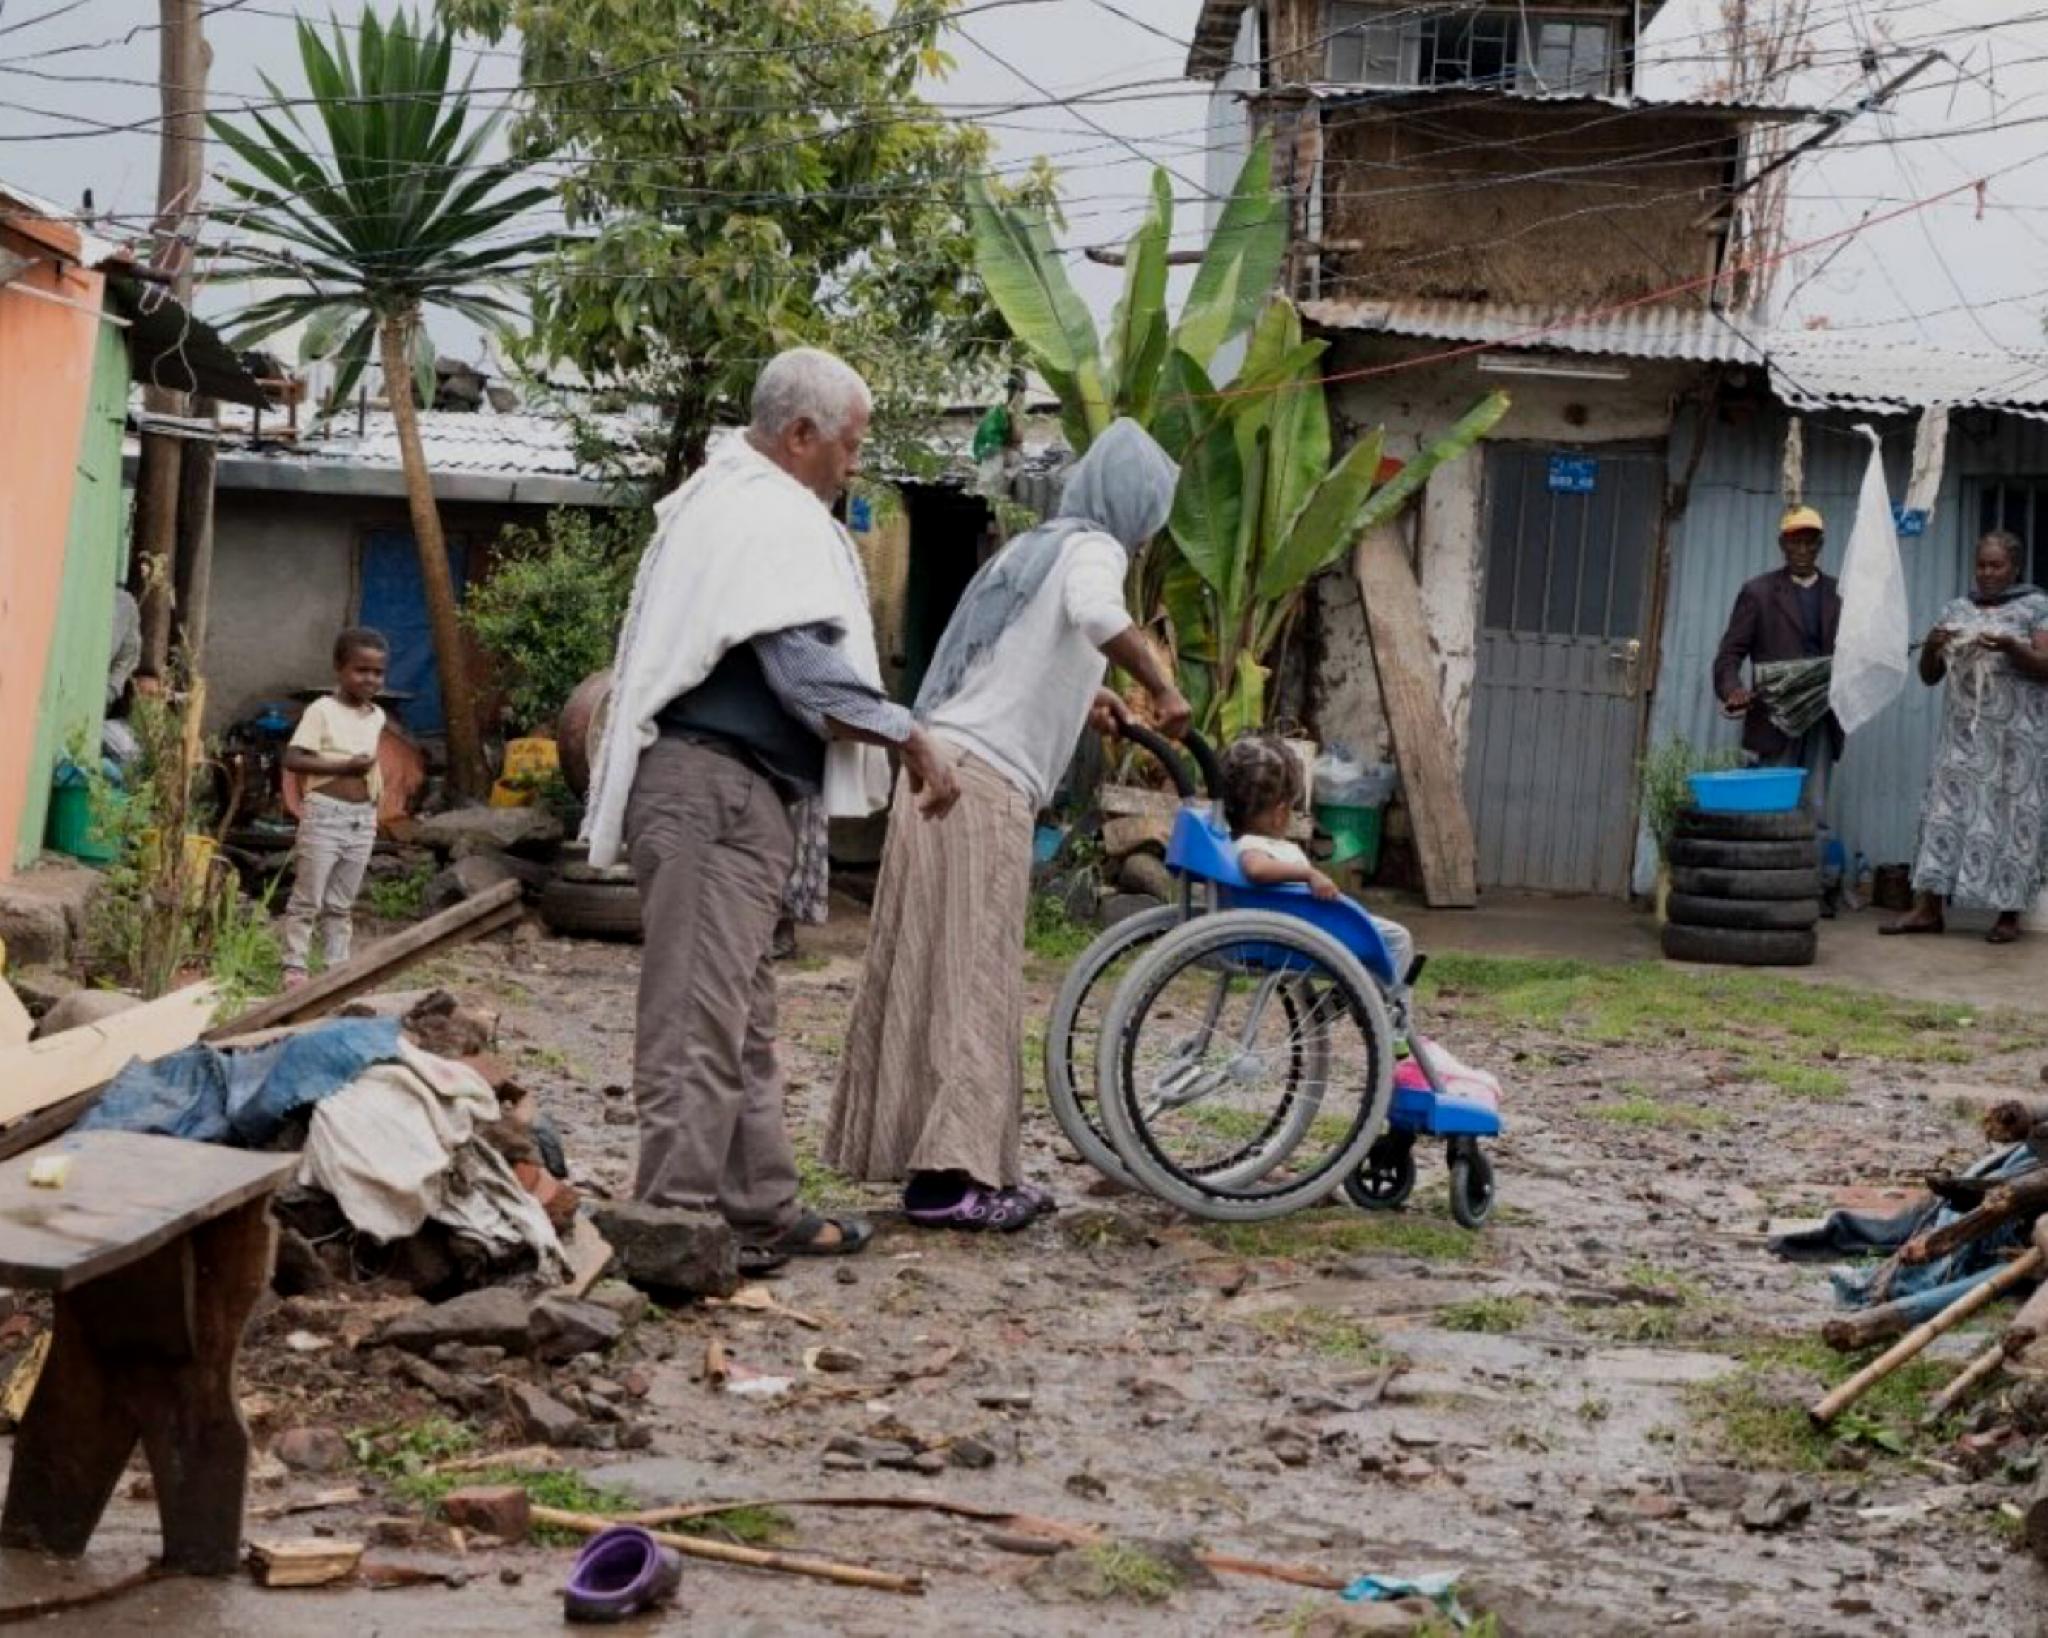 <b>Wheelchairs of Hope</b><br>